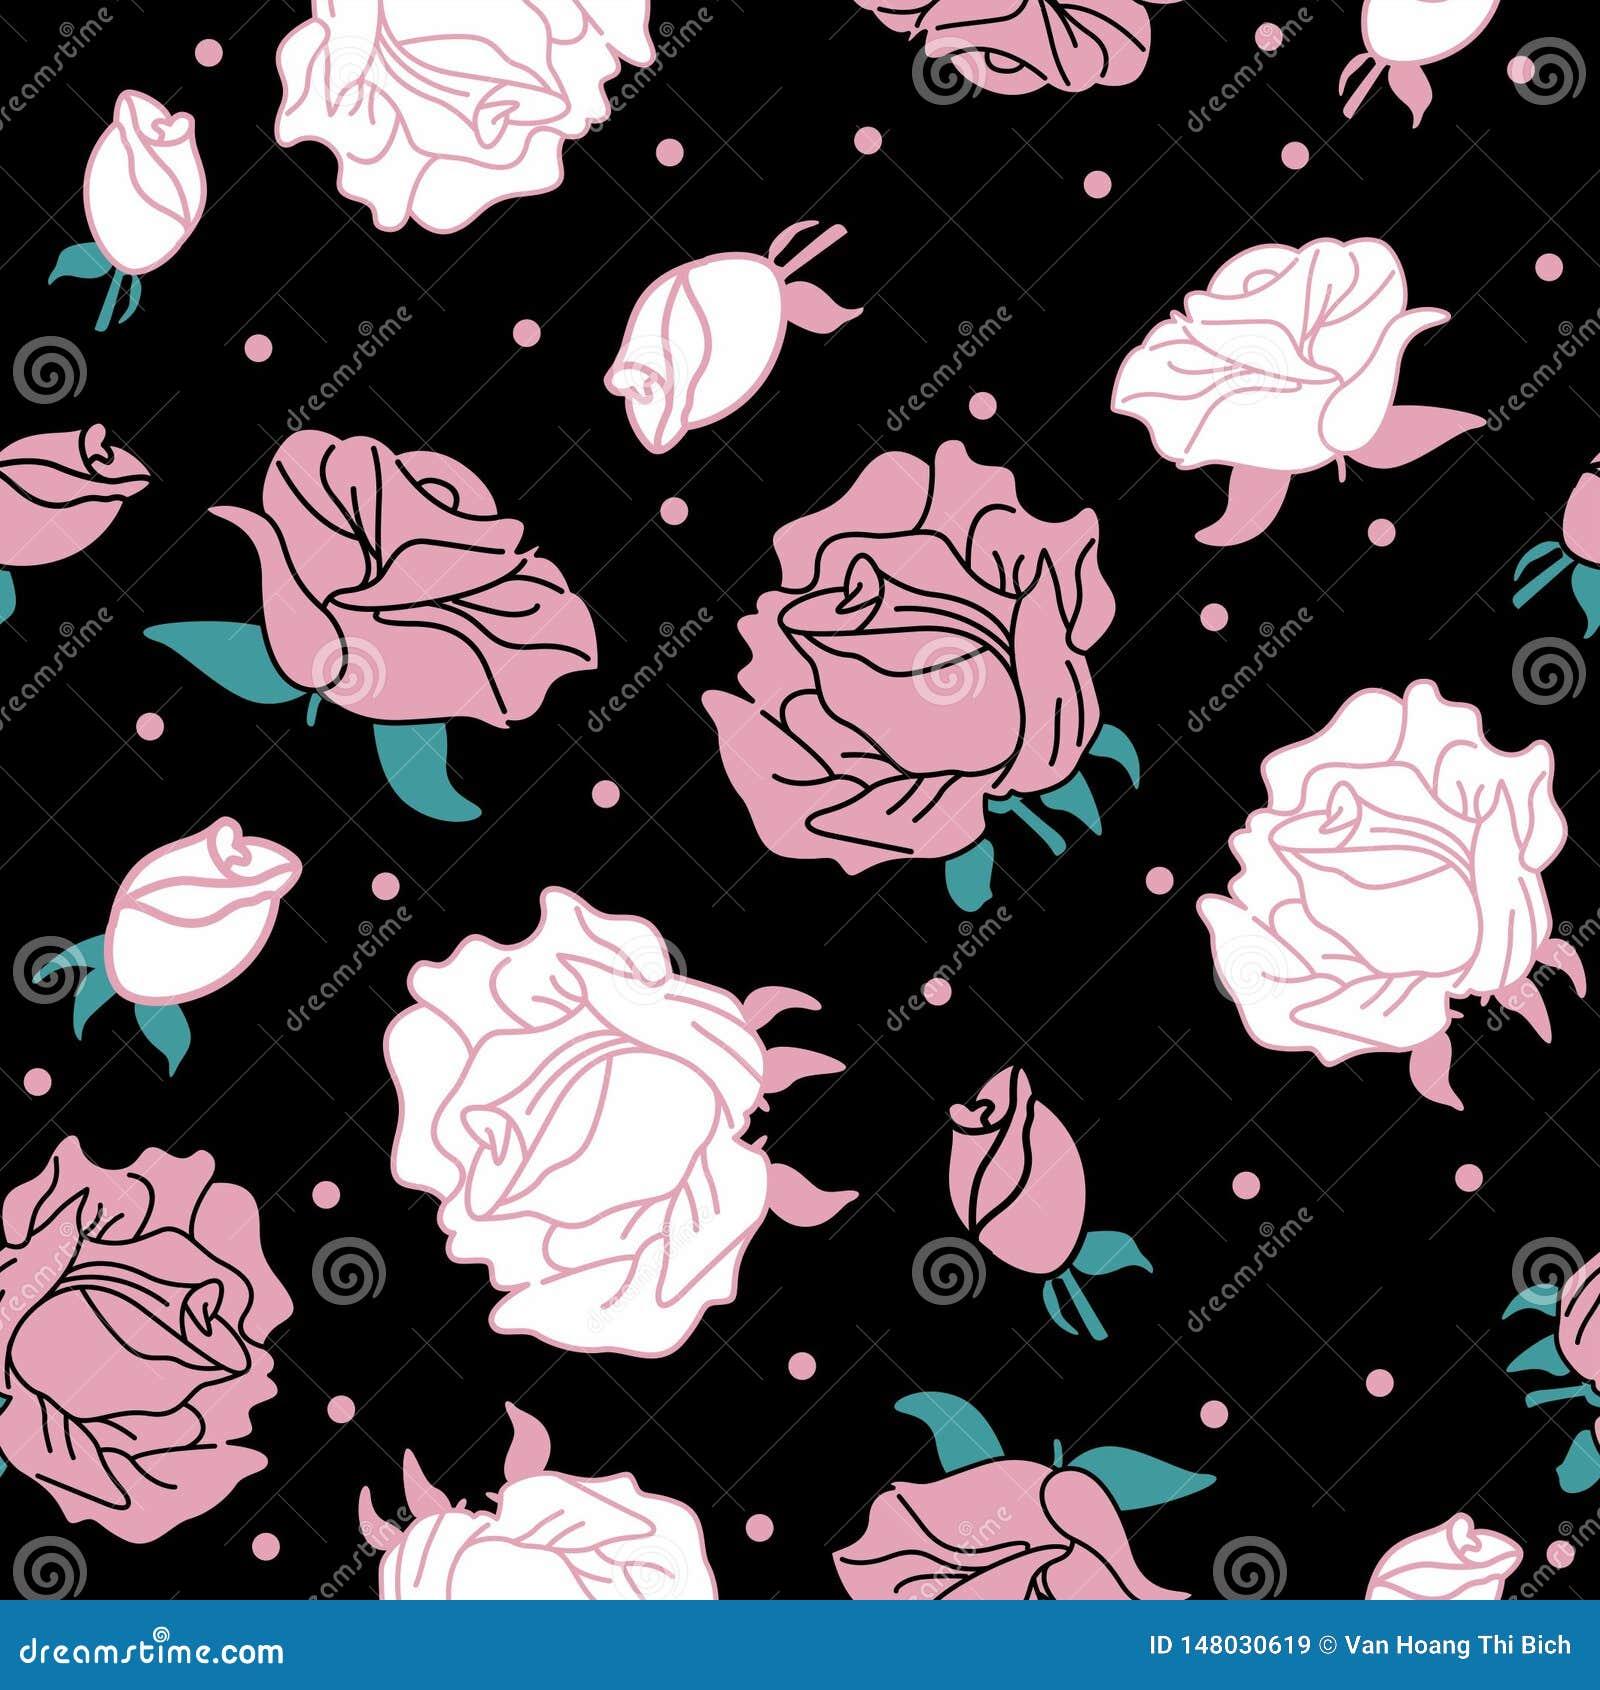 Rose on black background pattern seamless